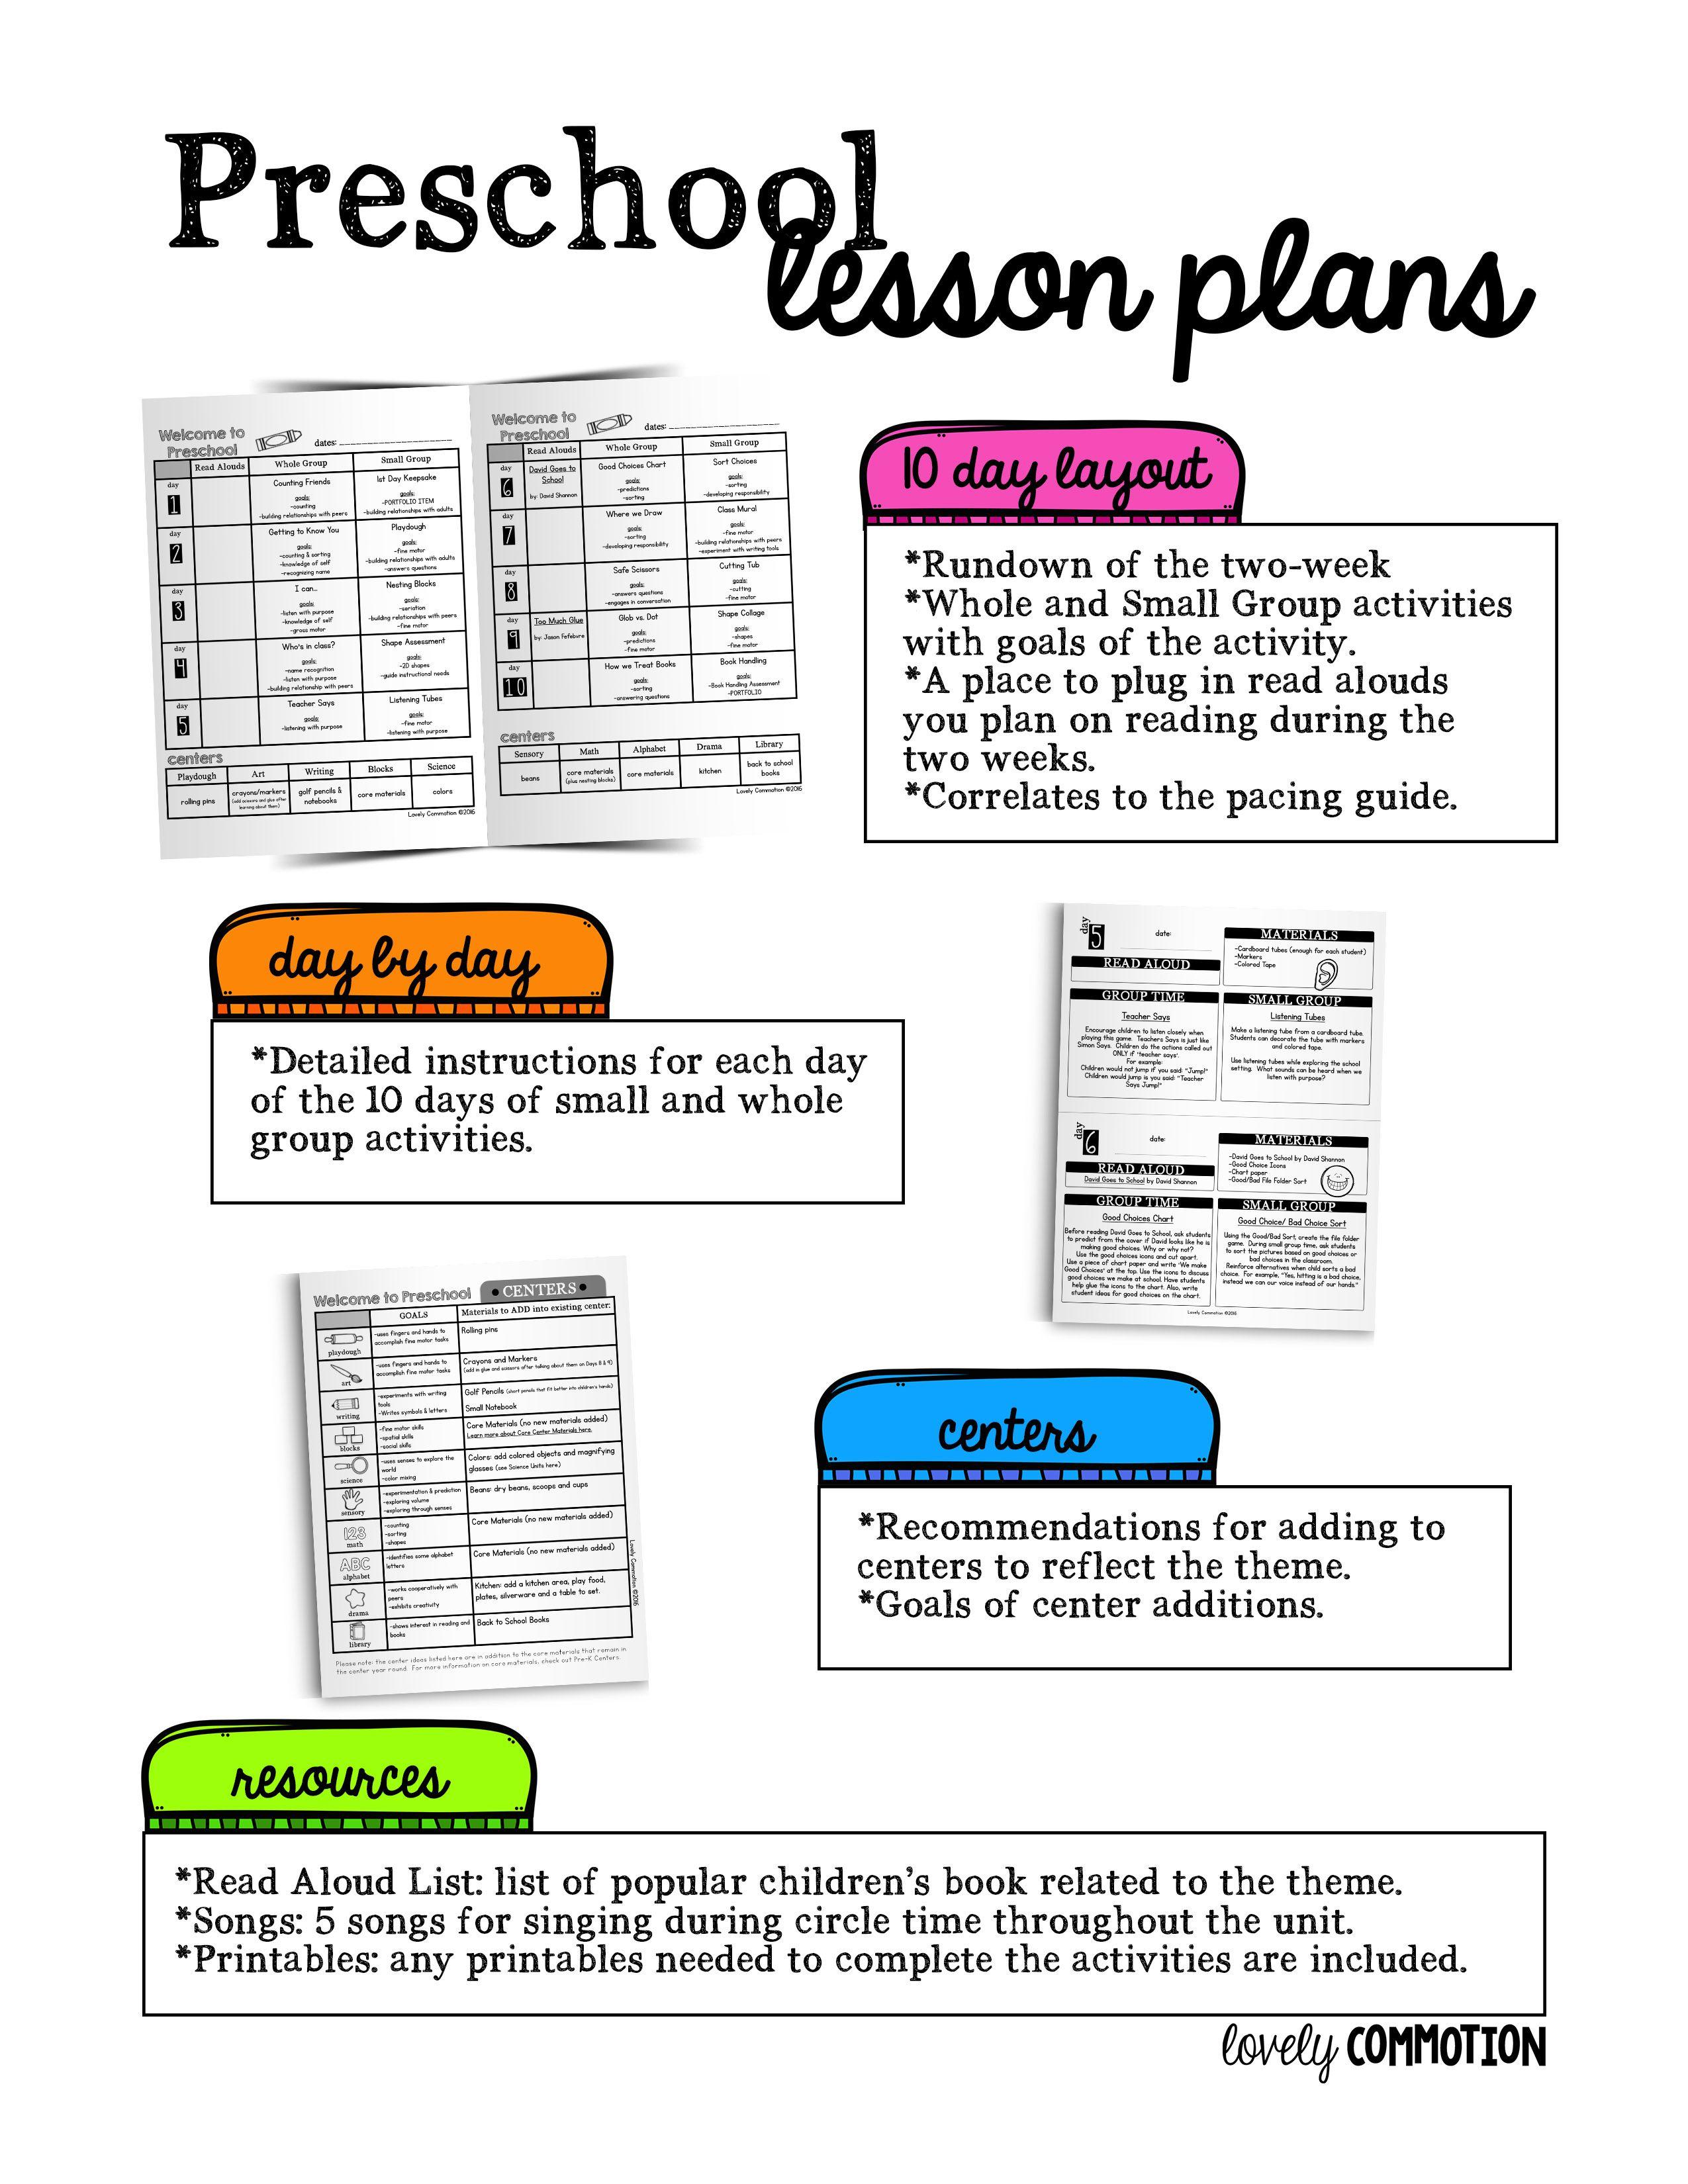 Preschool Transportation Lesson Plan Kindergarten Lesson Plans Kindergarten Lesson Plans Template Kindergarten Lessons [ 3300 x 2550 Pixel ]